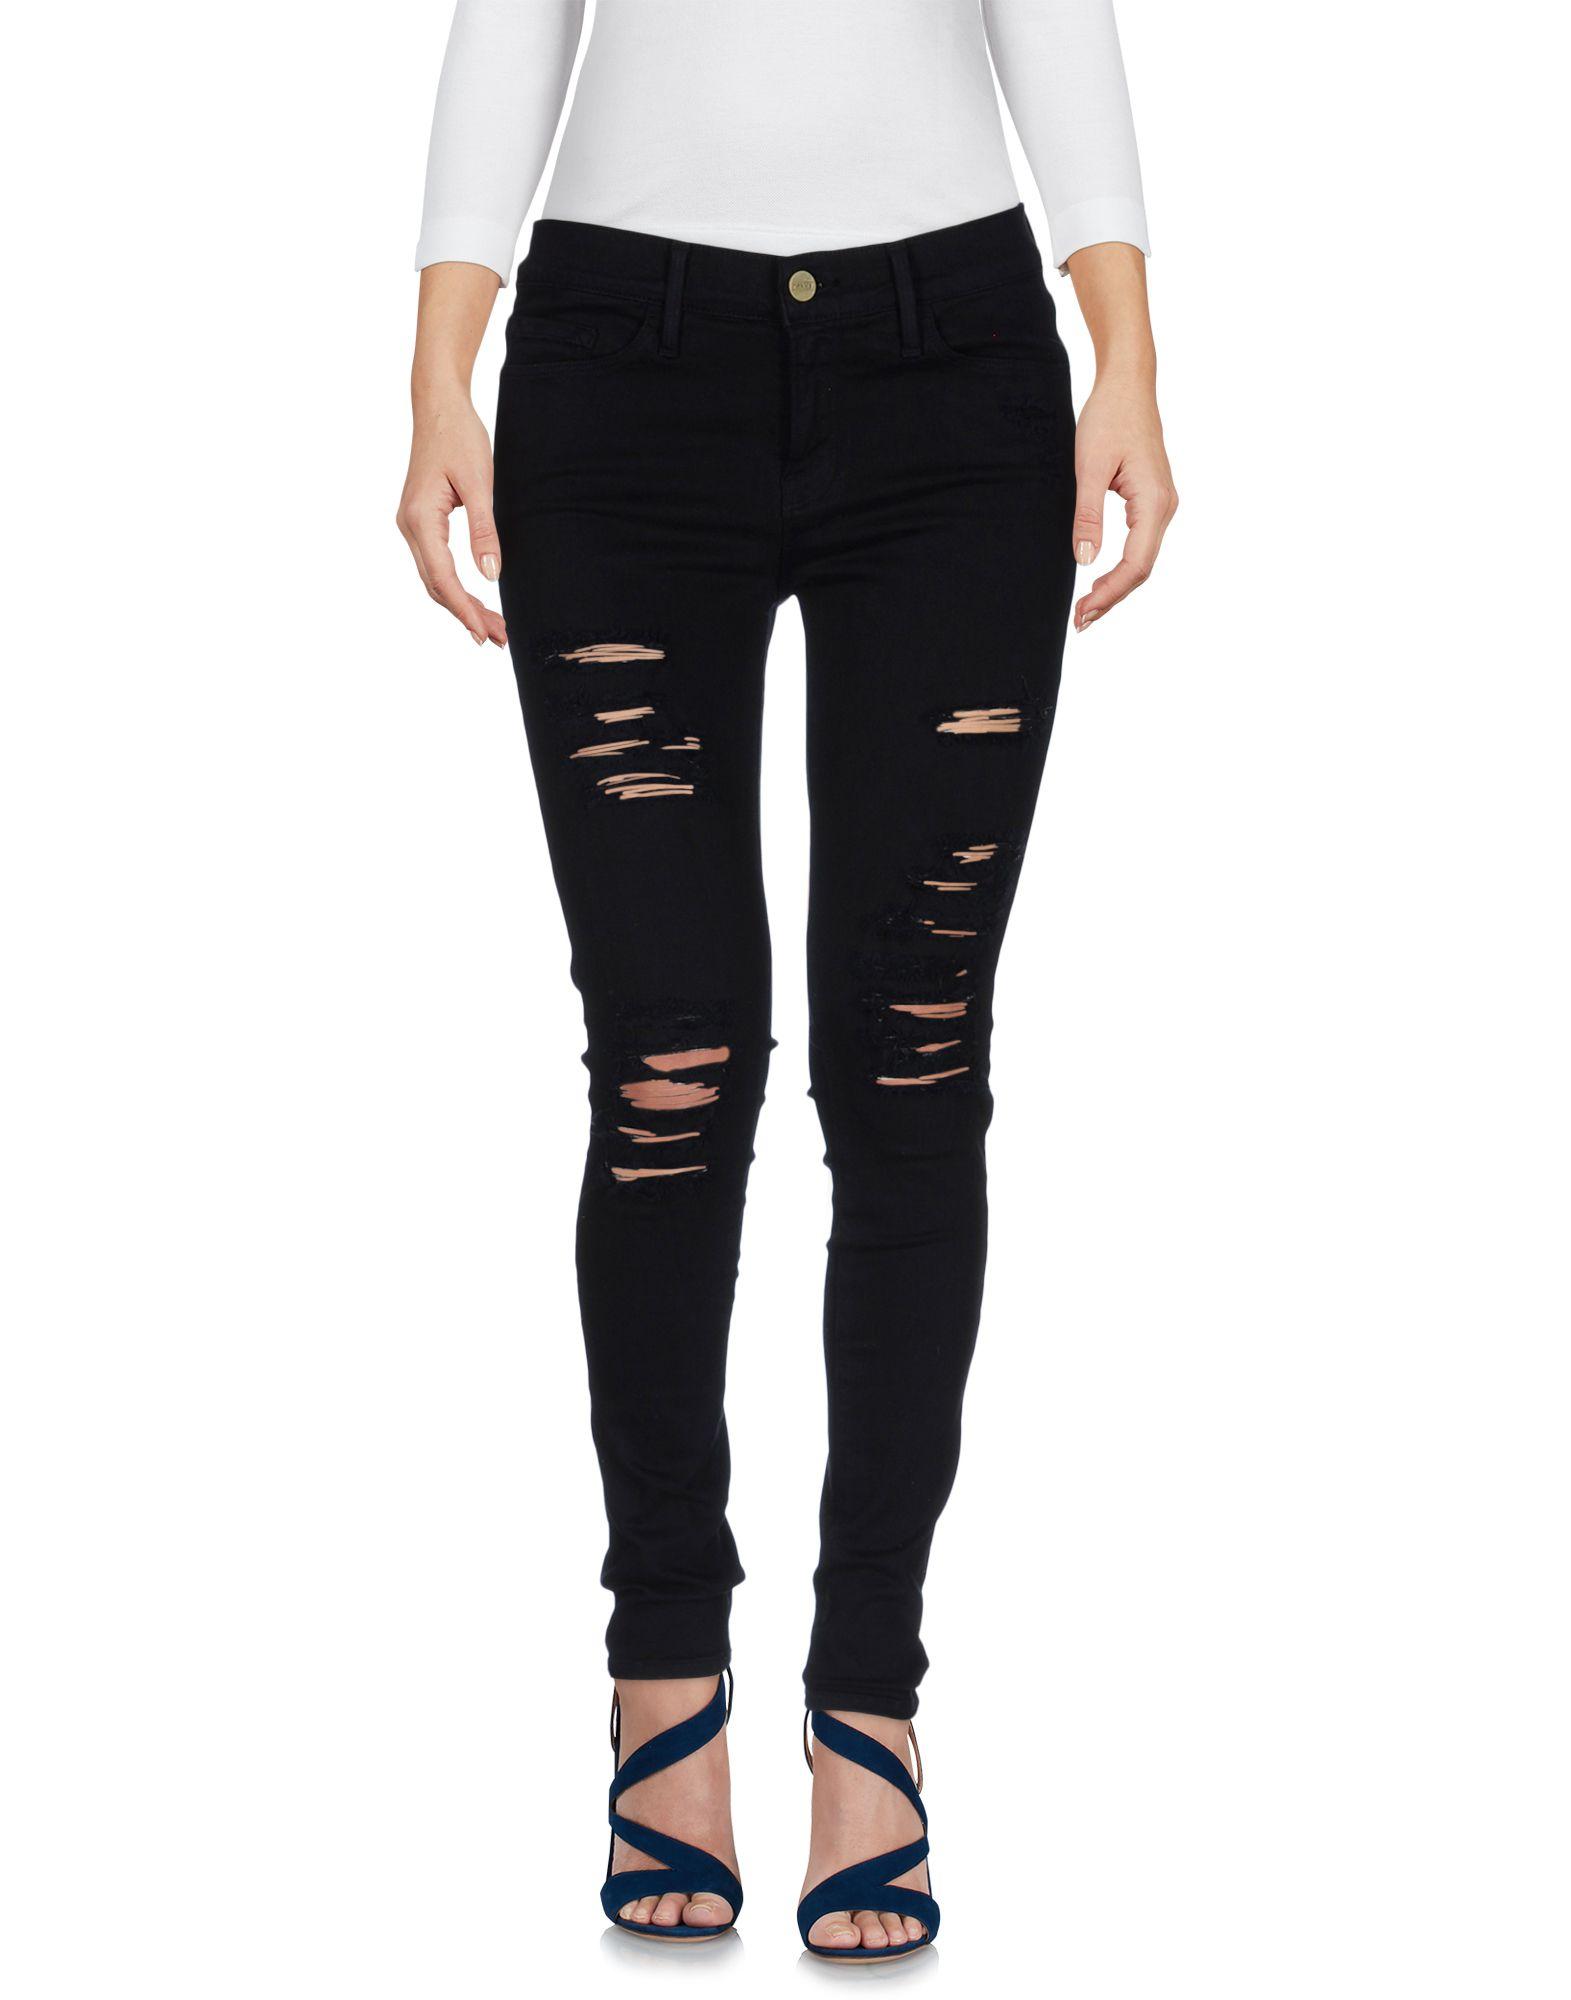 FRAME Damen Jeanshose Farbe Dunkelblau Größe 5 - broschei